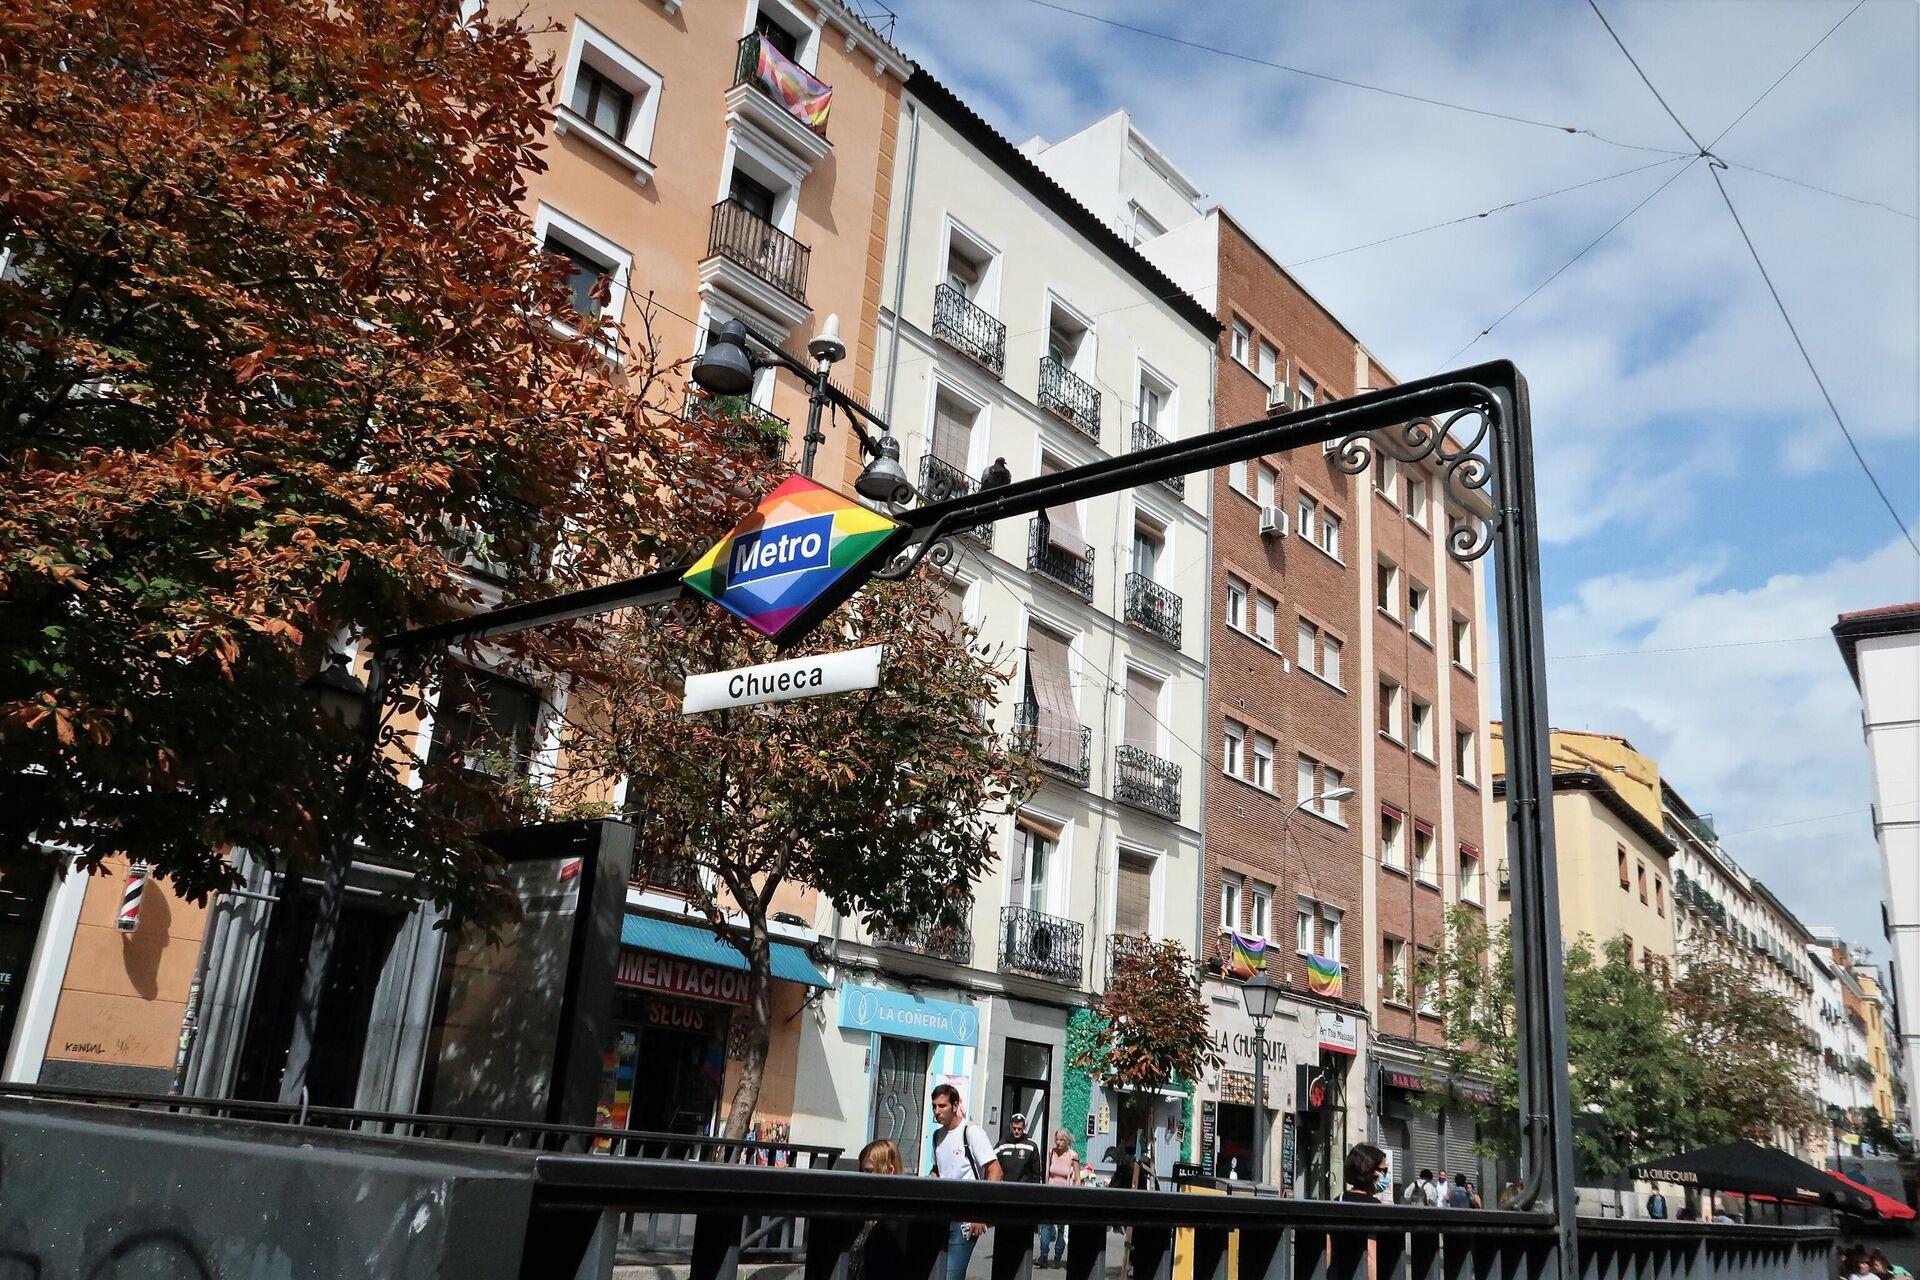 Parada de metro de Chueca, en Madrid, con la bandera arcoiris - Sputnik Mundo, 1920, 01.10.2021